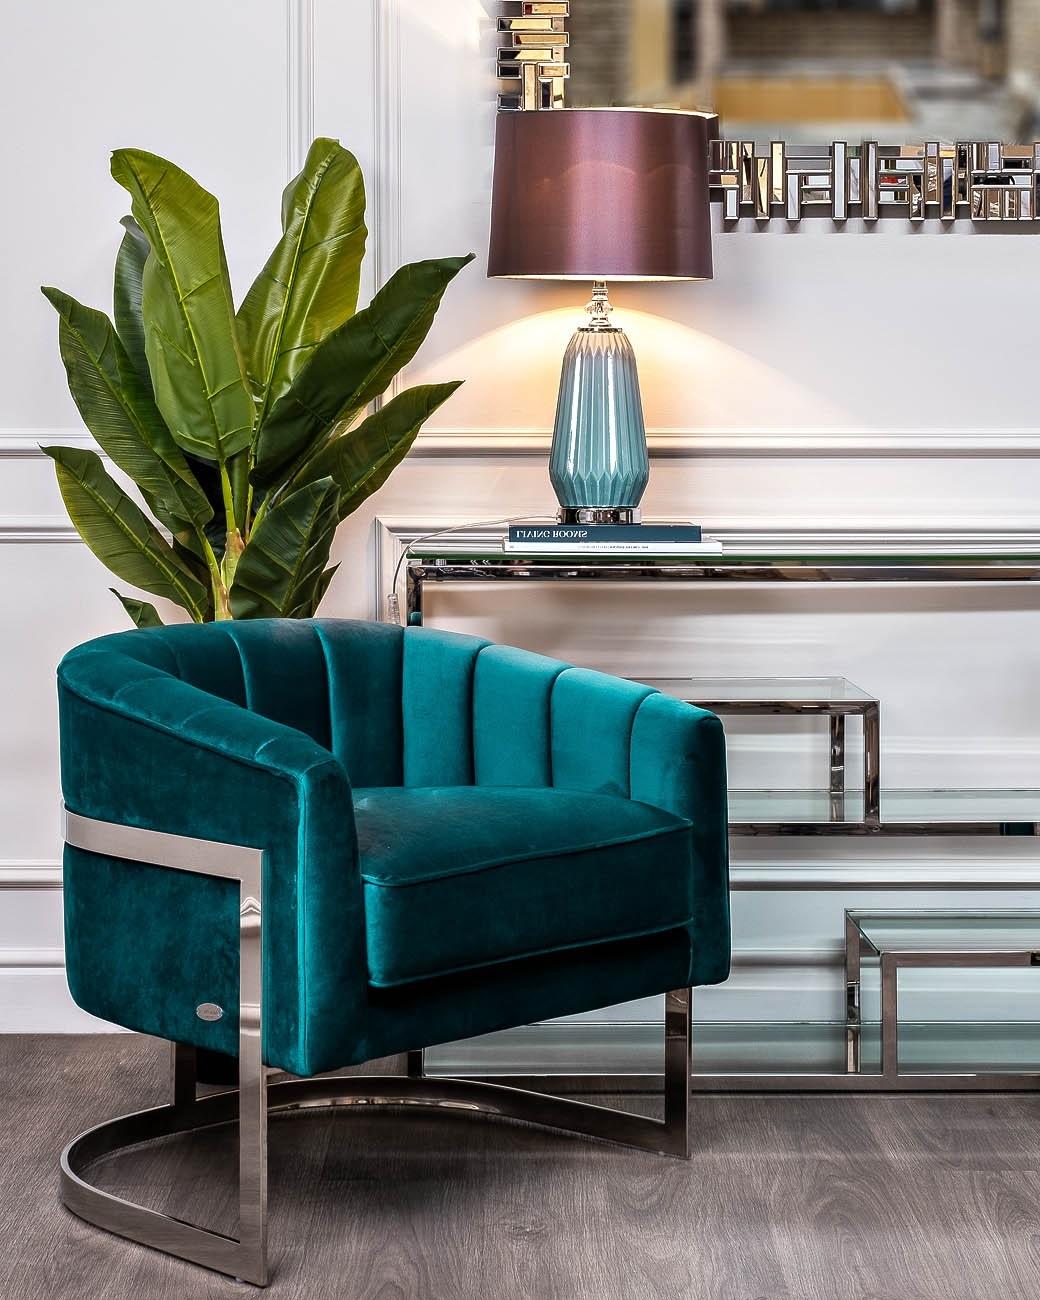 Кресло на металлическом каркасе сине-зеленое (ZW-777 GRN SS) Garda Decor